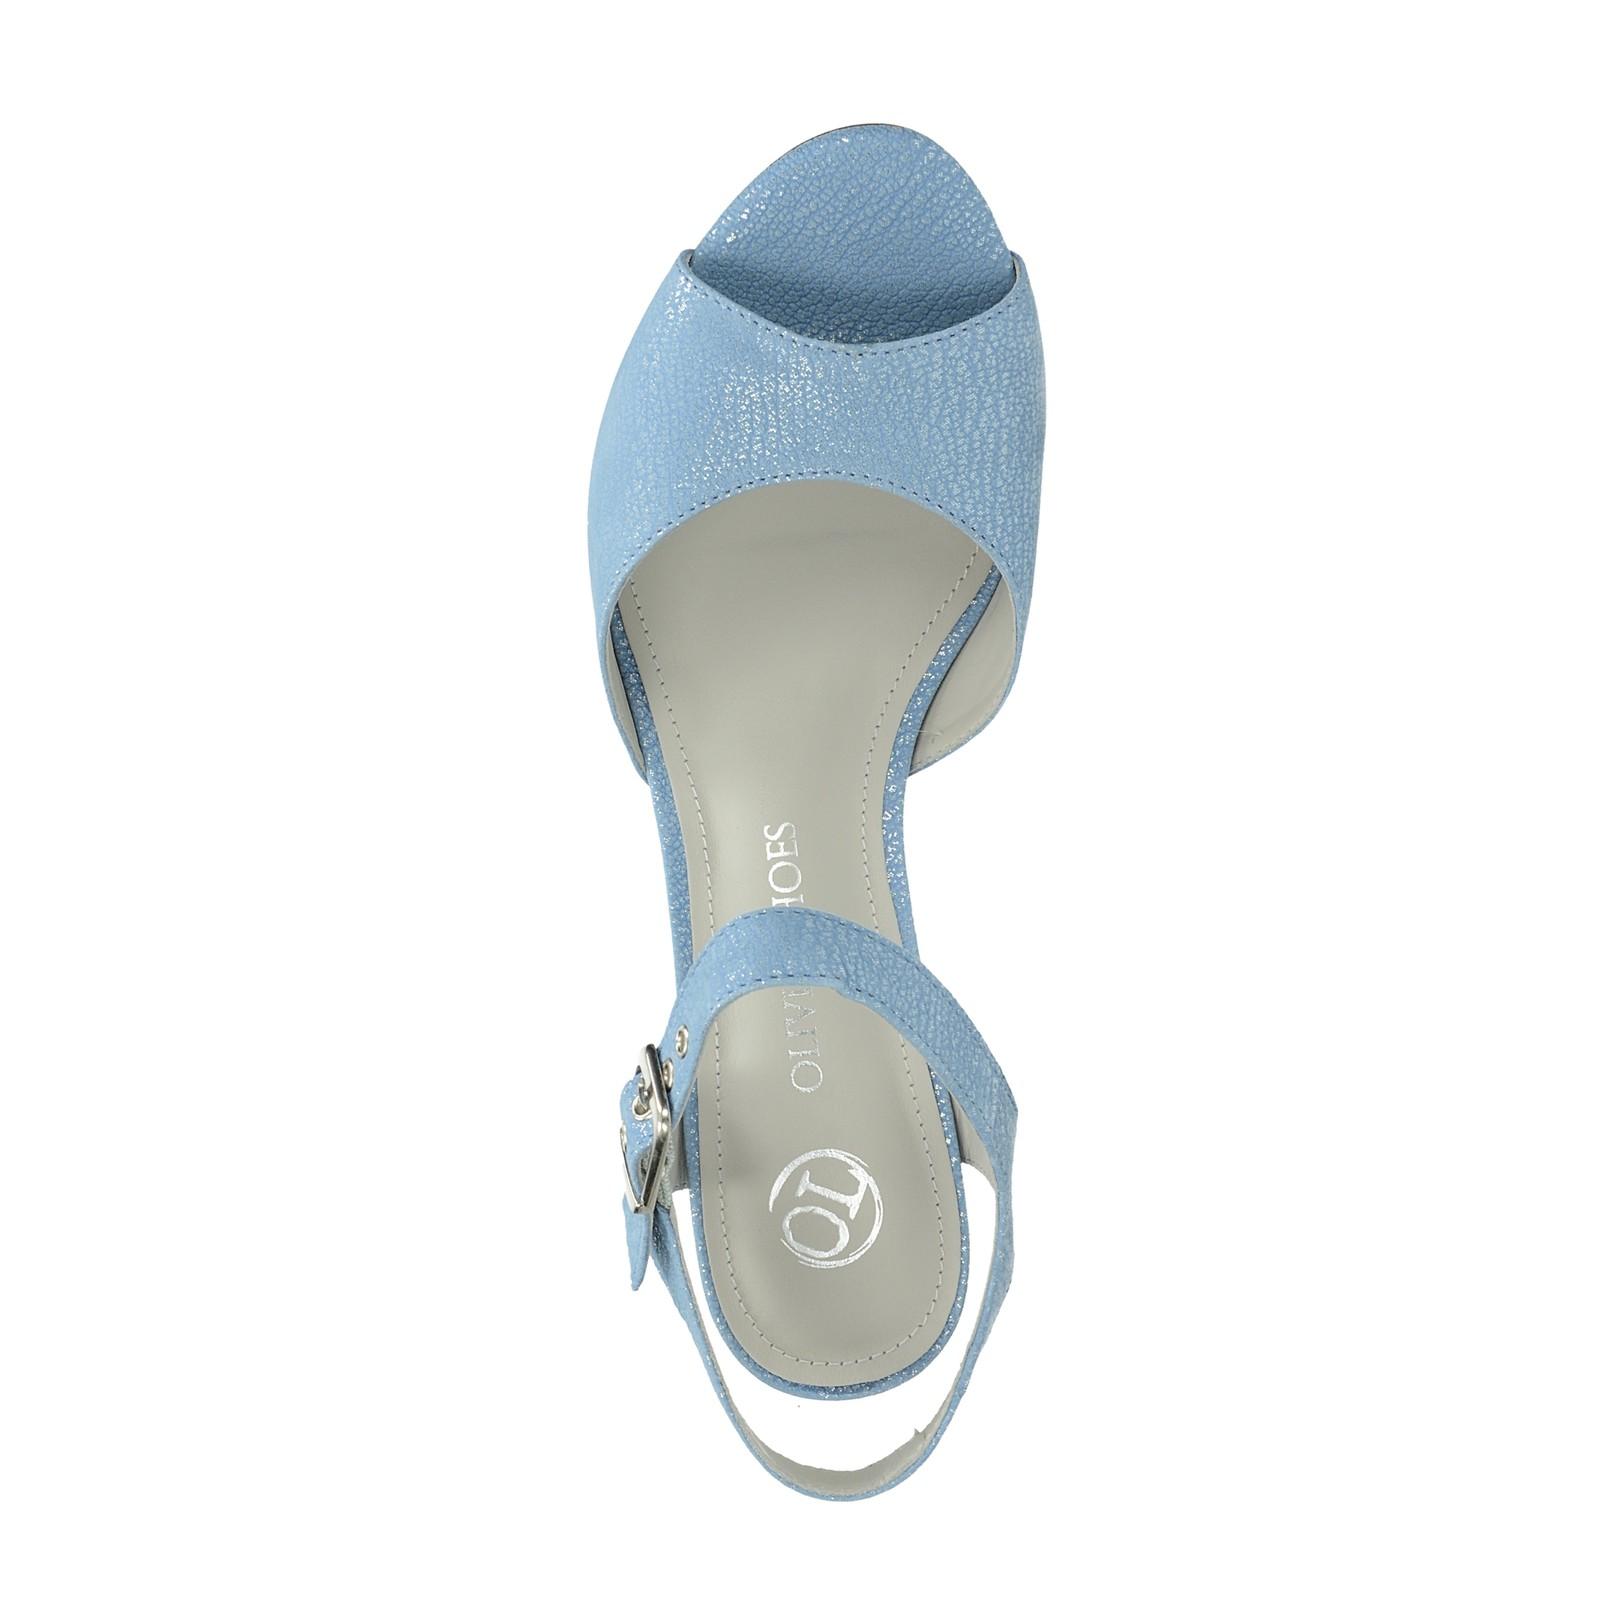 743f12c4e3f7 Olivia shoes dámske štýlové sandále s remienkom - modré ...